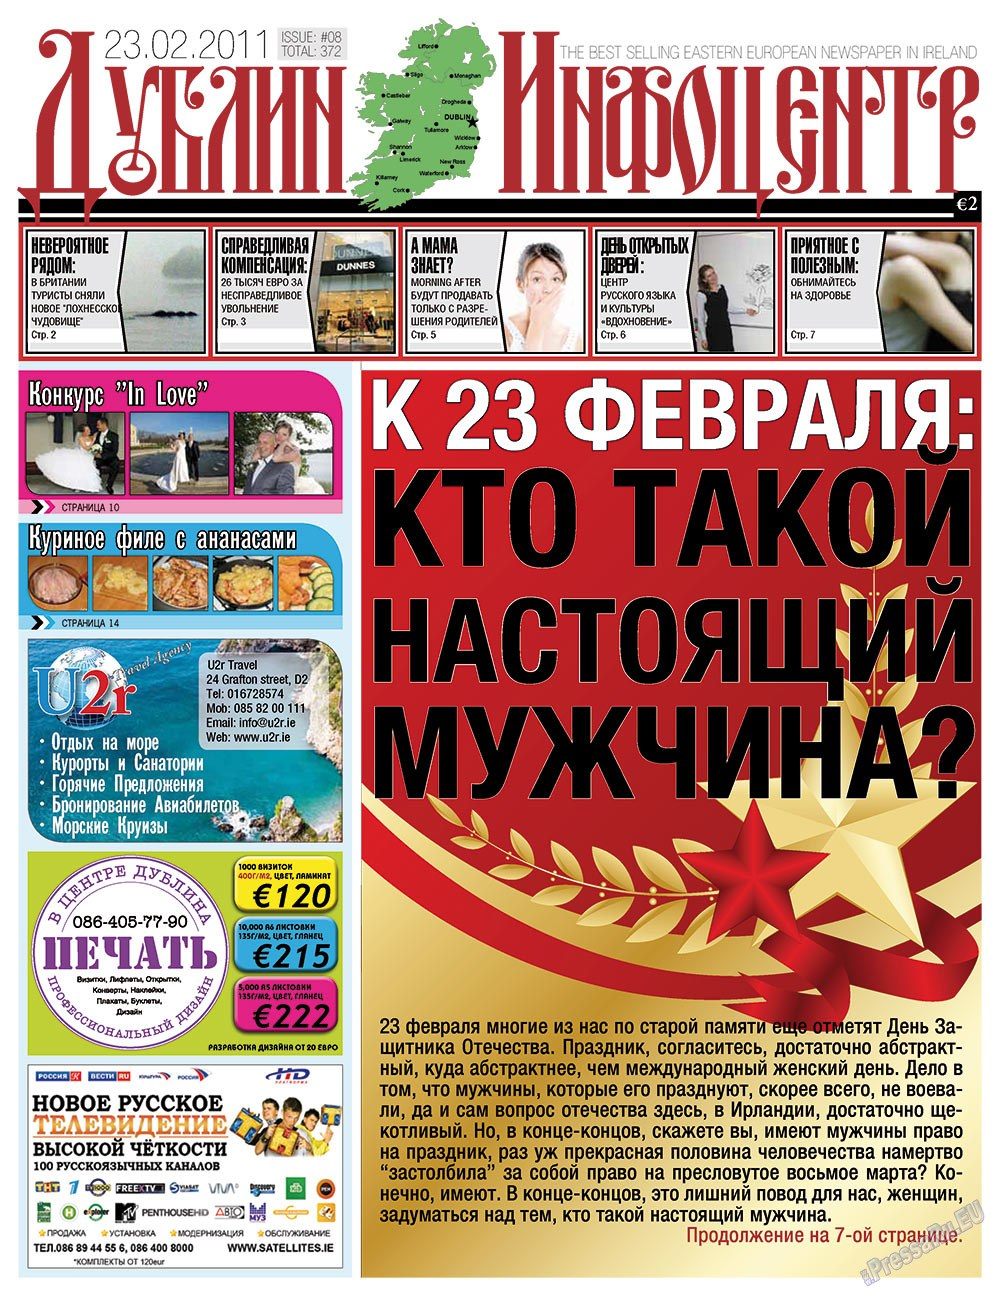 Дублин инфоцентр (газета). 2011 год, номер 8, стр. 1